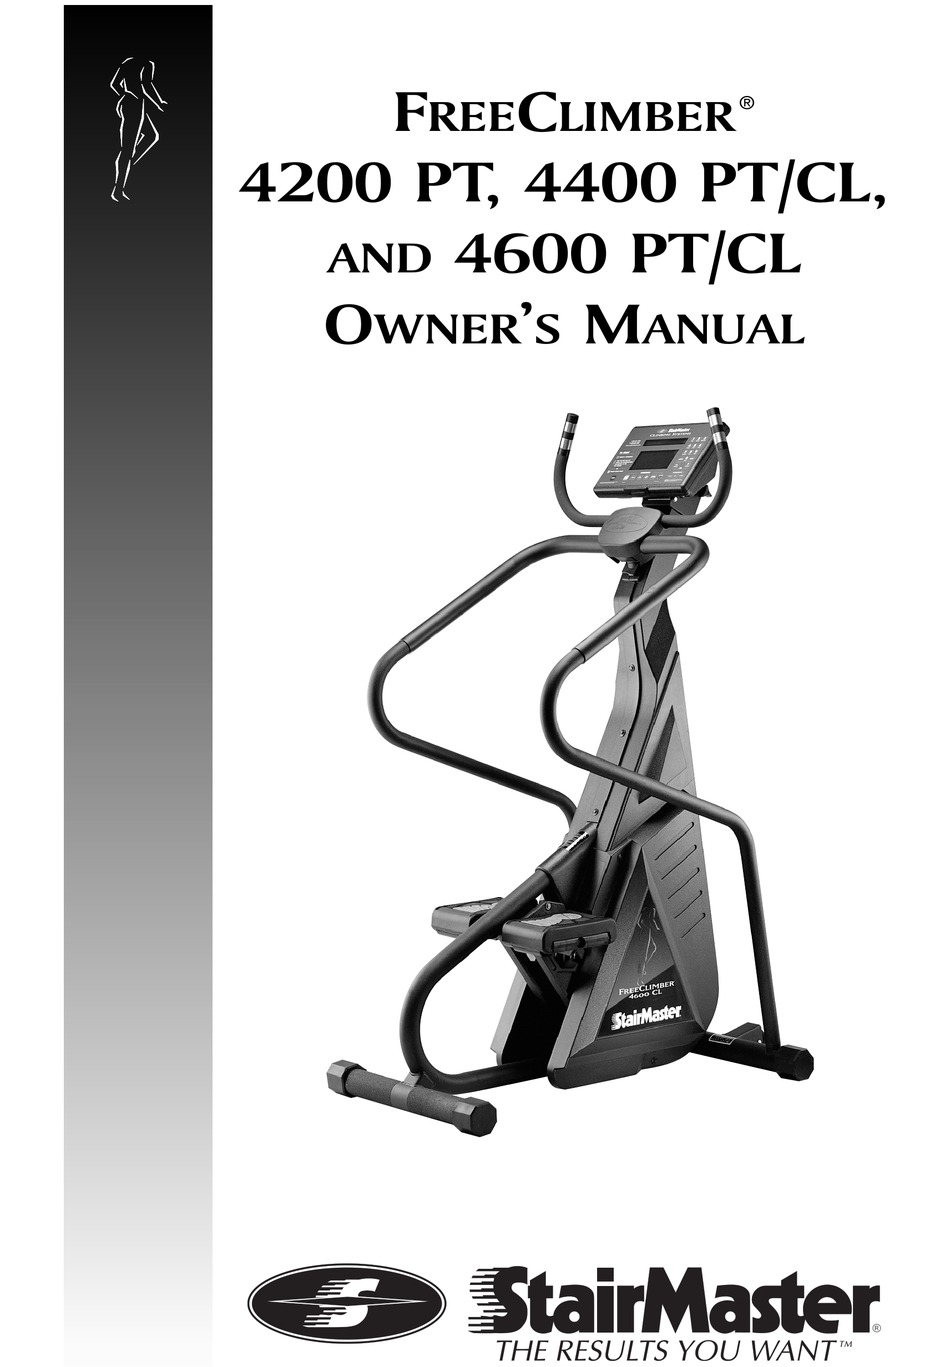 Stairmaster Freeclimber 4400 Pt Cl Owner S Manual Pdf Download Manualslib